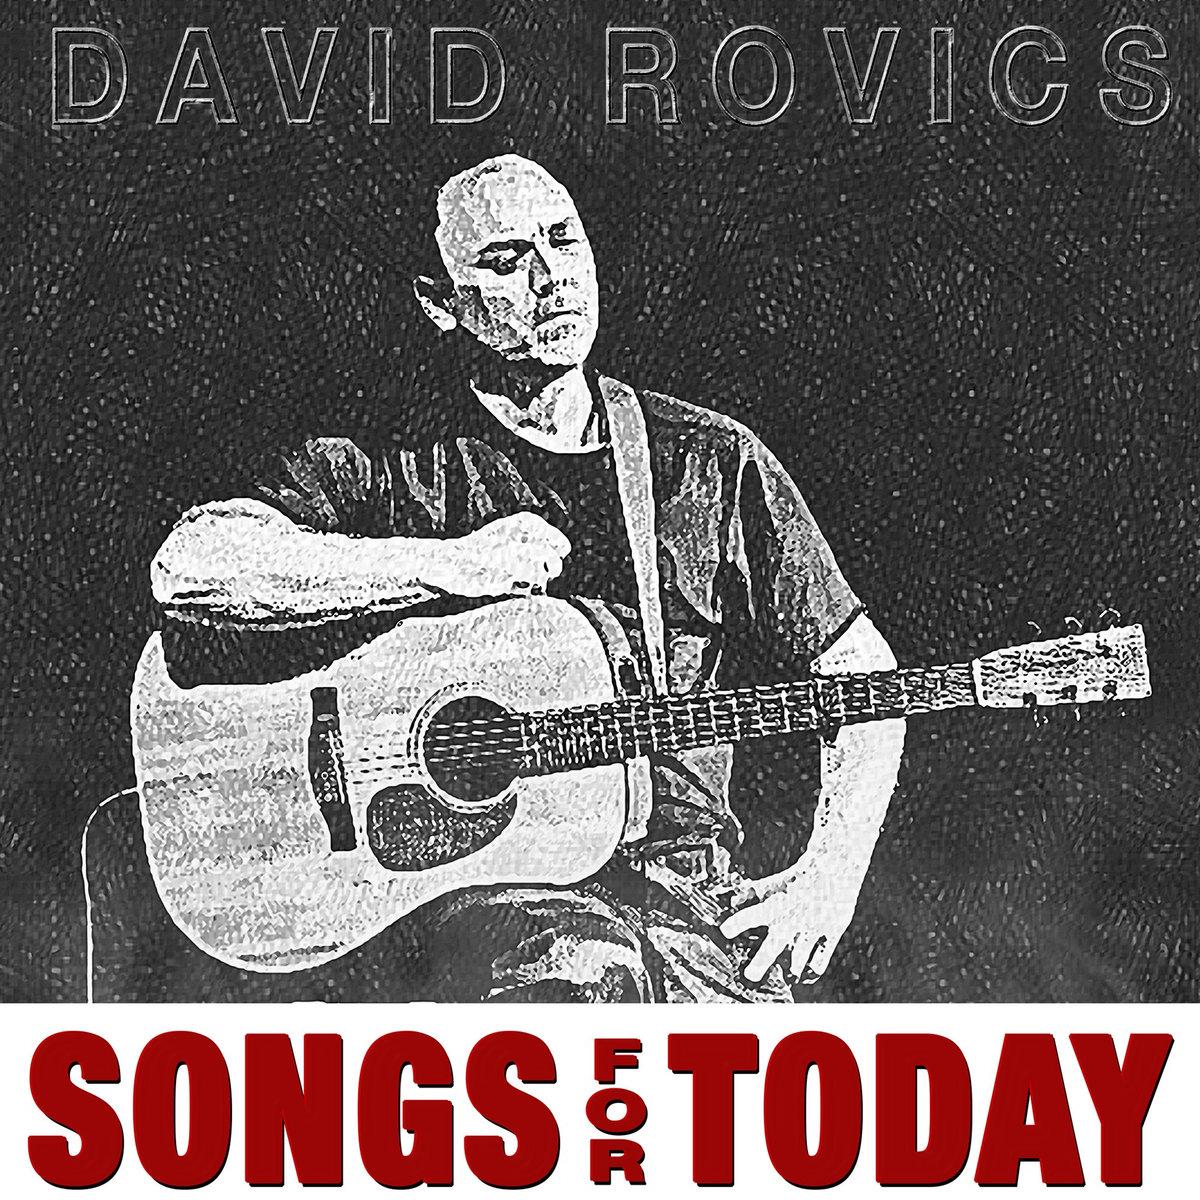 DAVID ROVICS - SONGS FOR TODAY album artwork